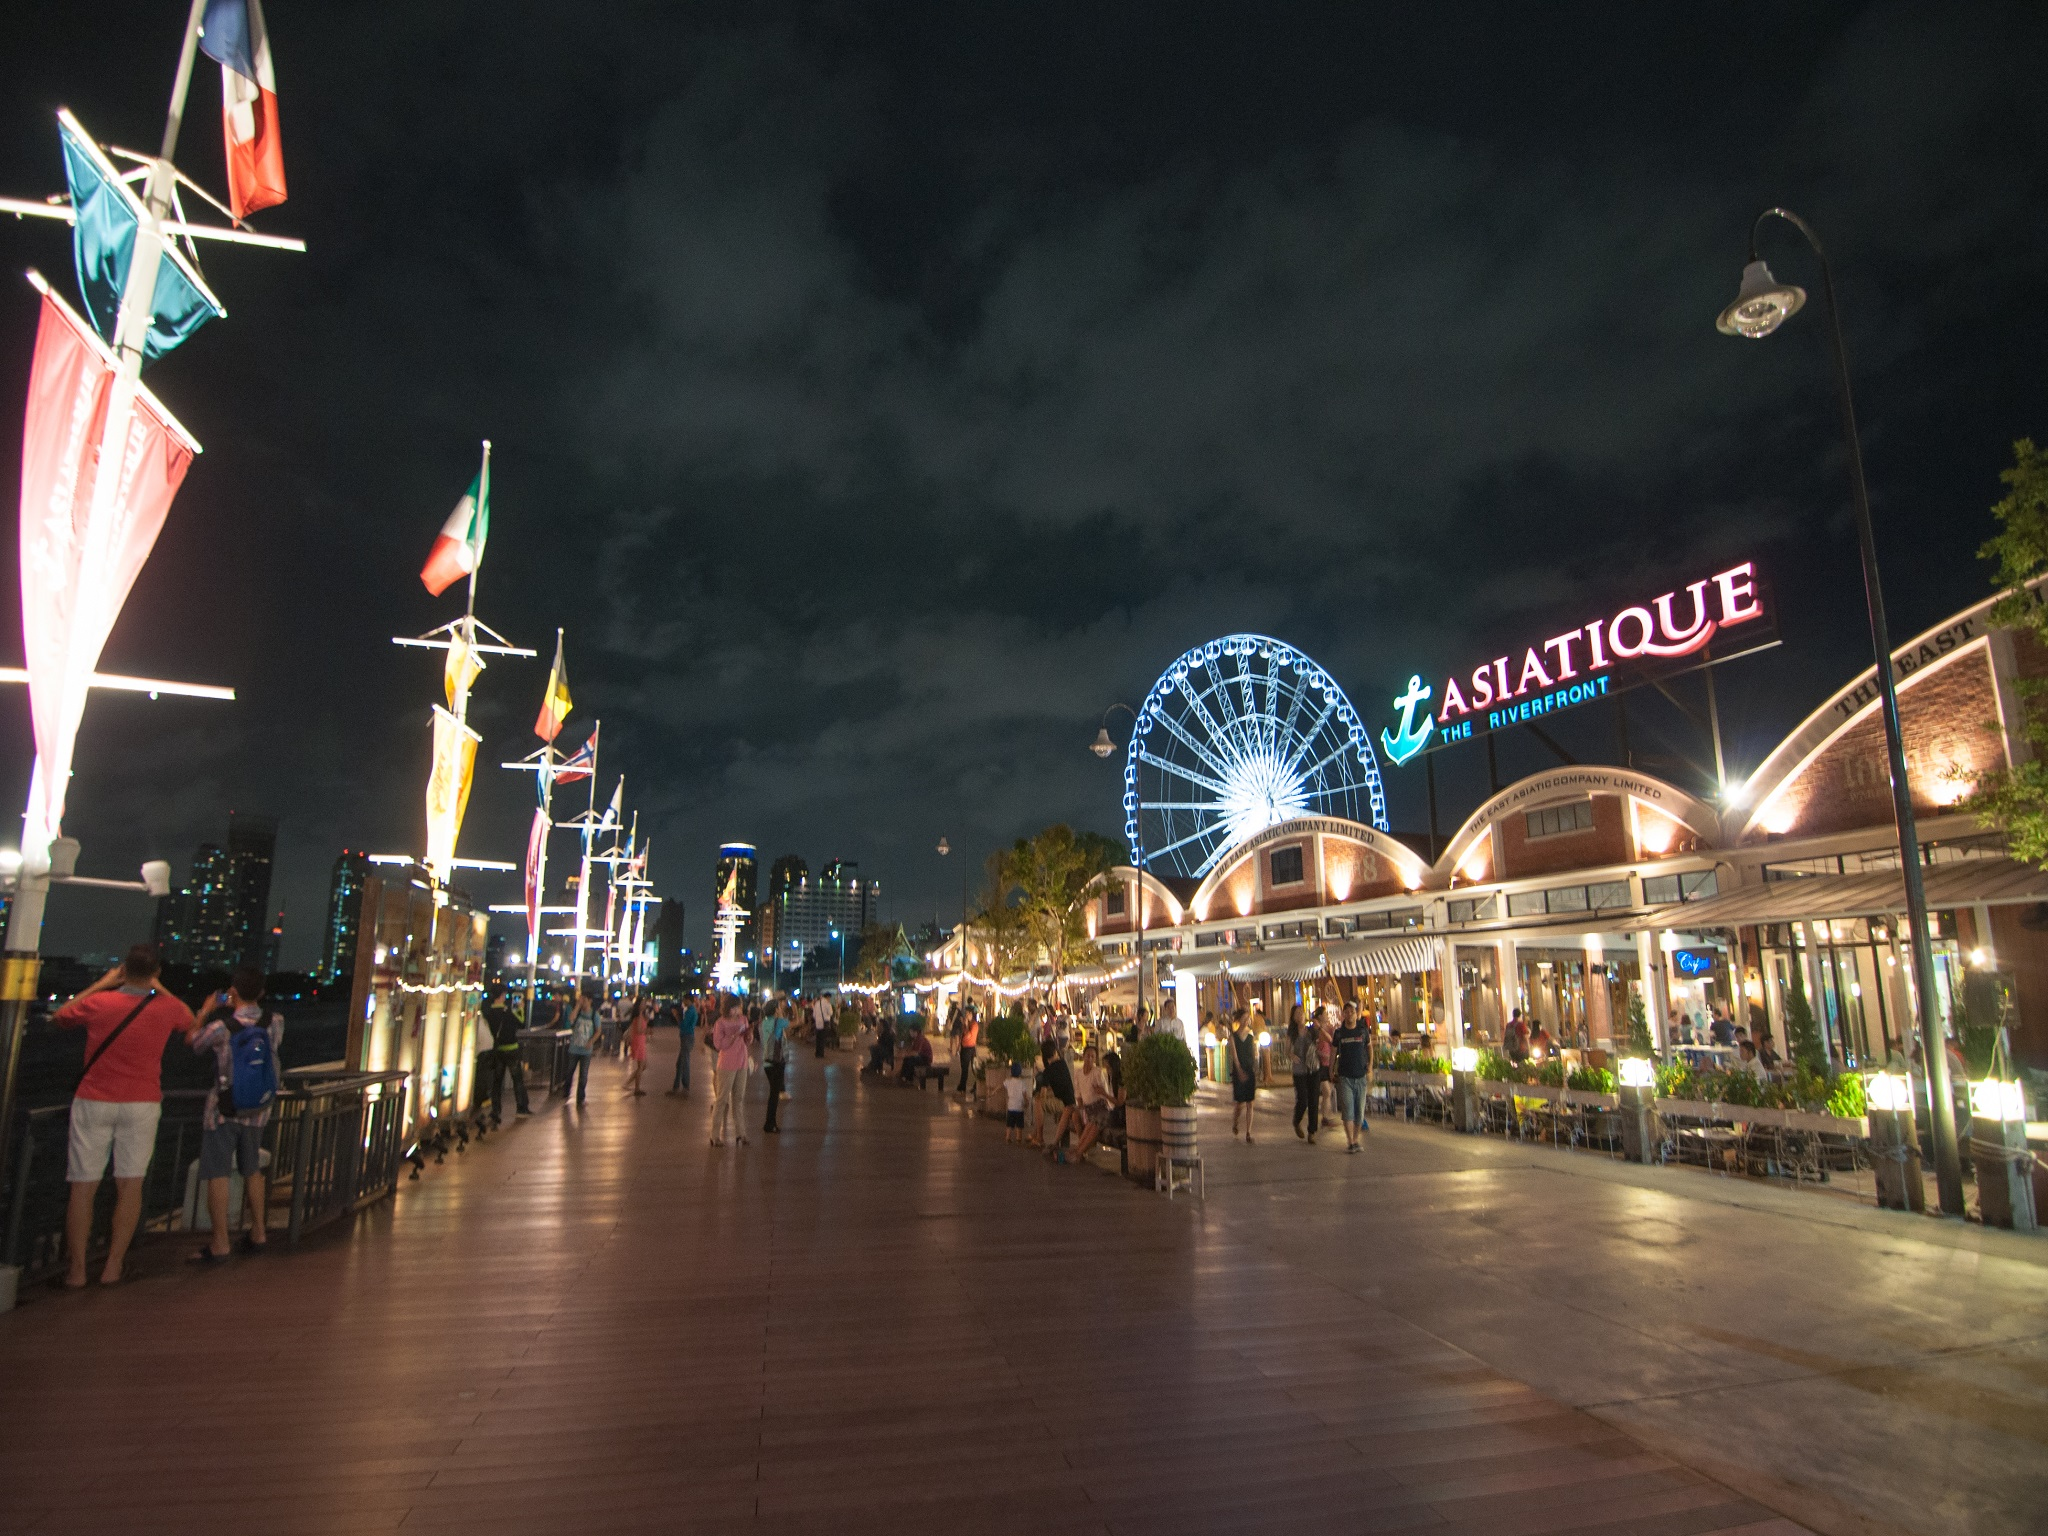 Riverside Nightlife - Top Nightlife activities in Chiang Mai